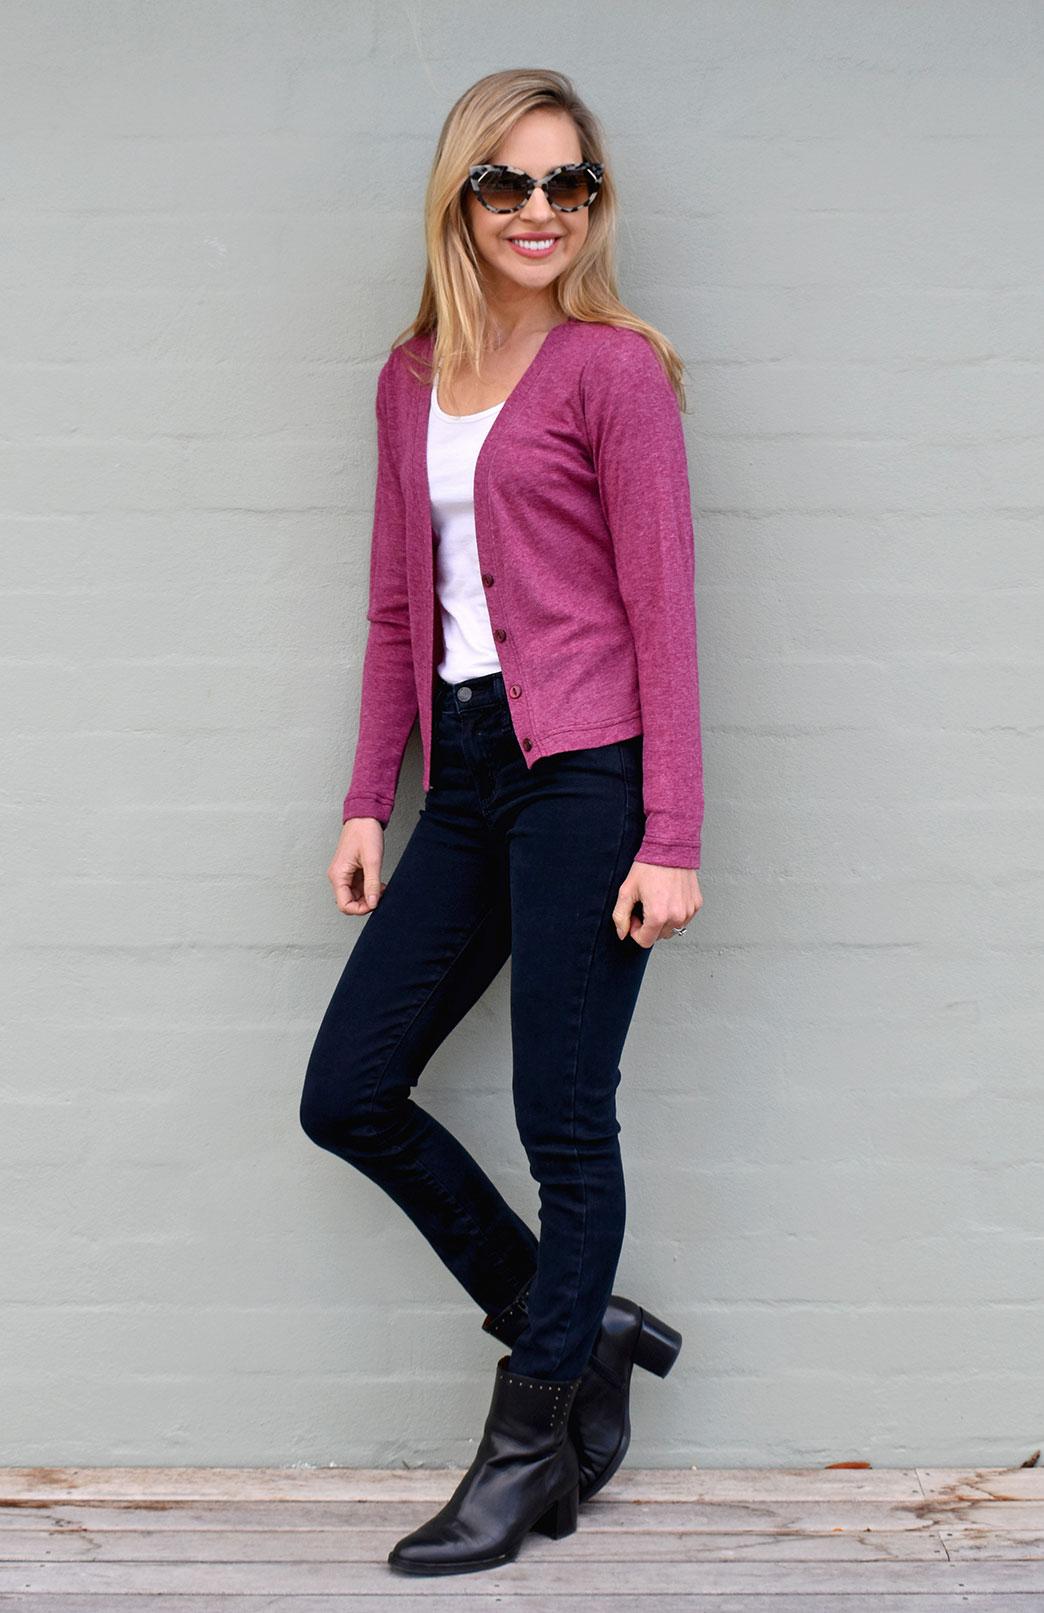 Crop Cardigan - Long Sleeved - Women's Classic Boysenberry Marl Long Sleeve Merino Wool Cropped Cardigan with Buttons - Smitten Merino Tasmania Australia